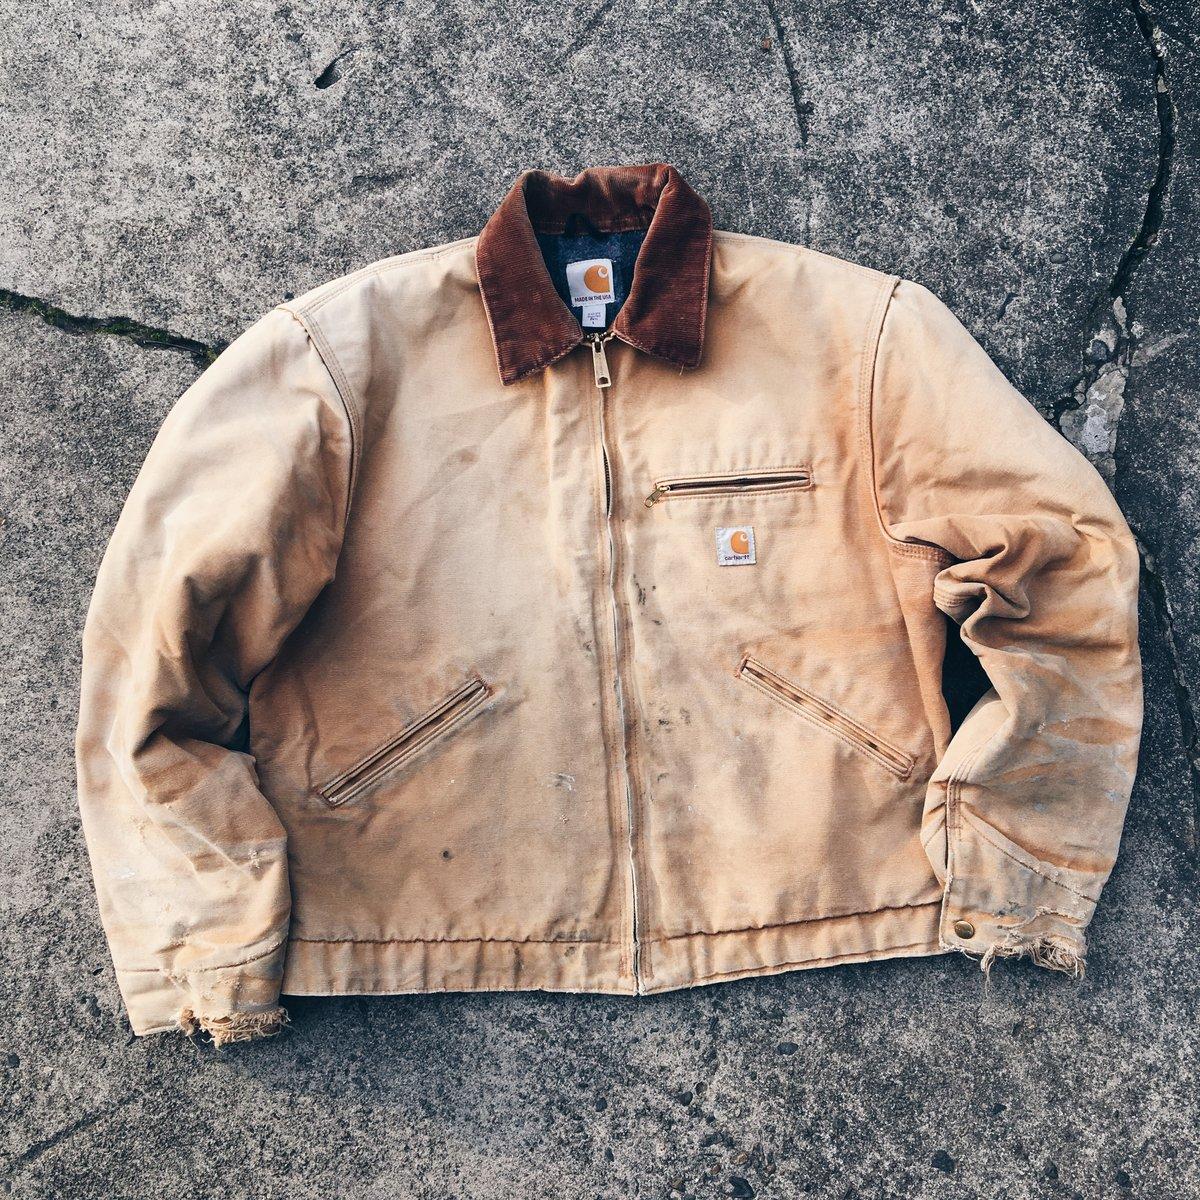 Image of Original Vintage Carhartt Work Jacket.